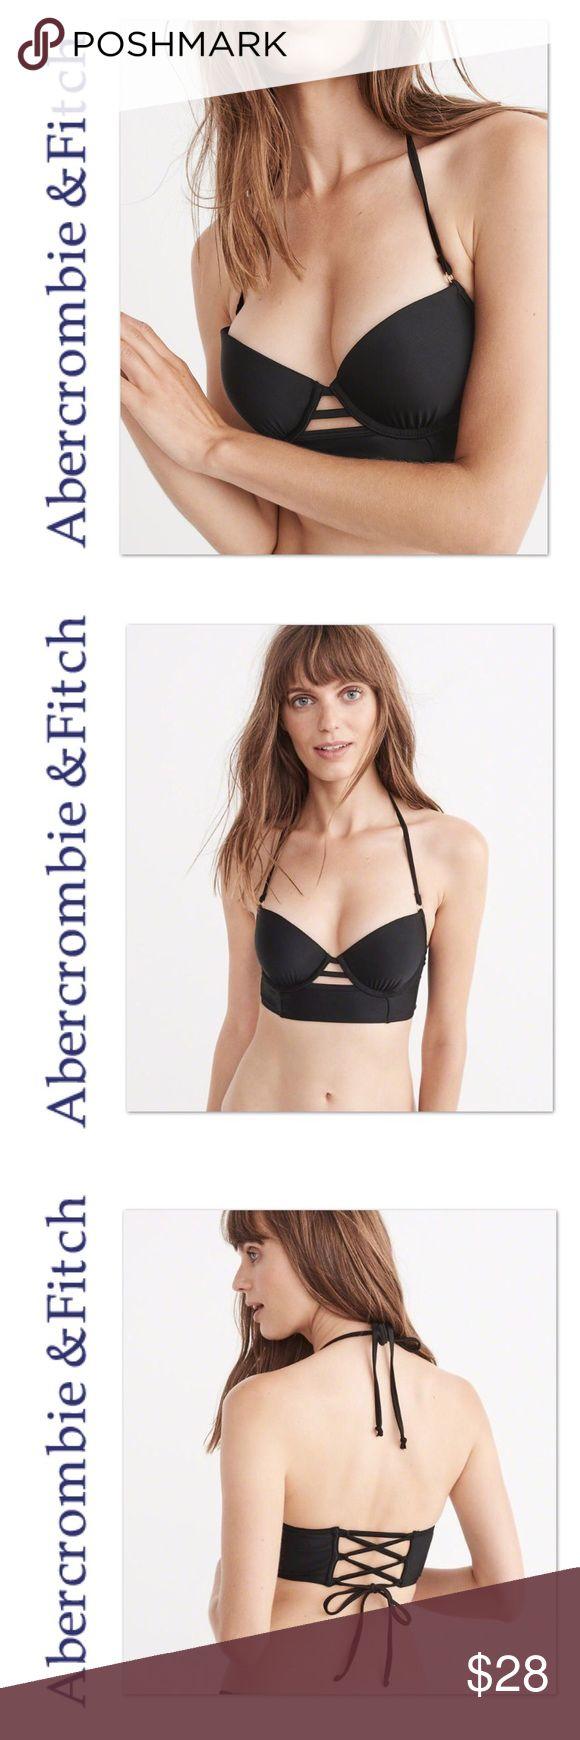 NWT Abercrombie & Fitch A&F Push Up Bikini Top New Abercrombie & Fitch Swim Bikinis